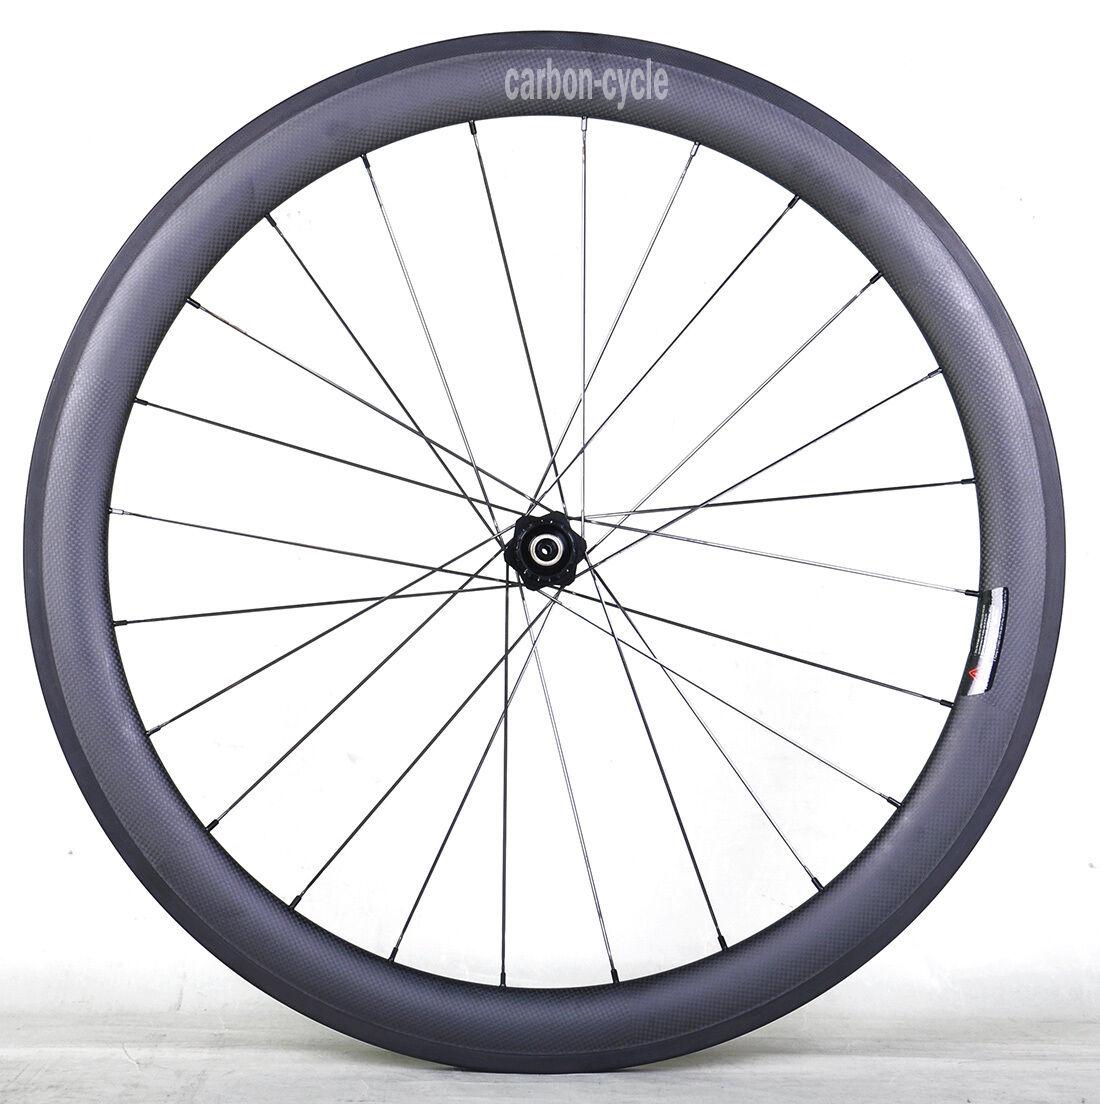 DT240s 50mm Sapim Carbon Clincher Rear Wheel 700C 25mm 3k Matt Road Bike Rim